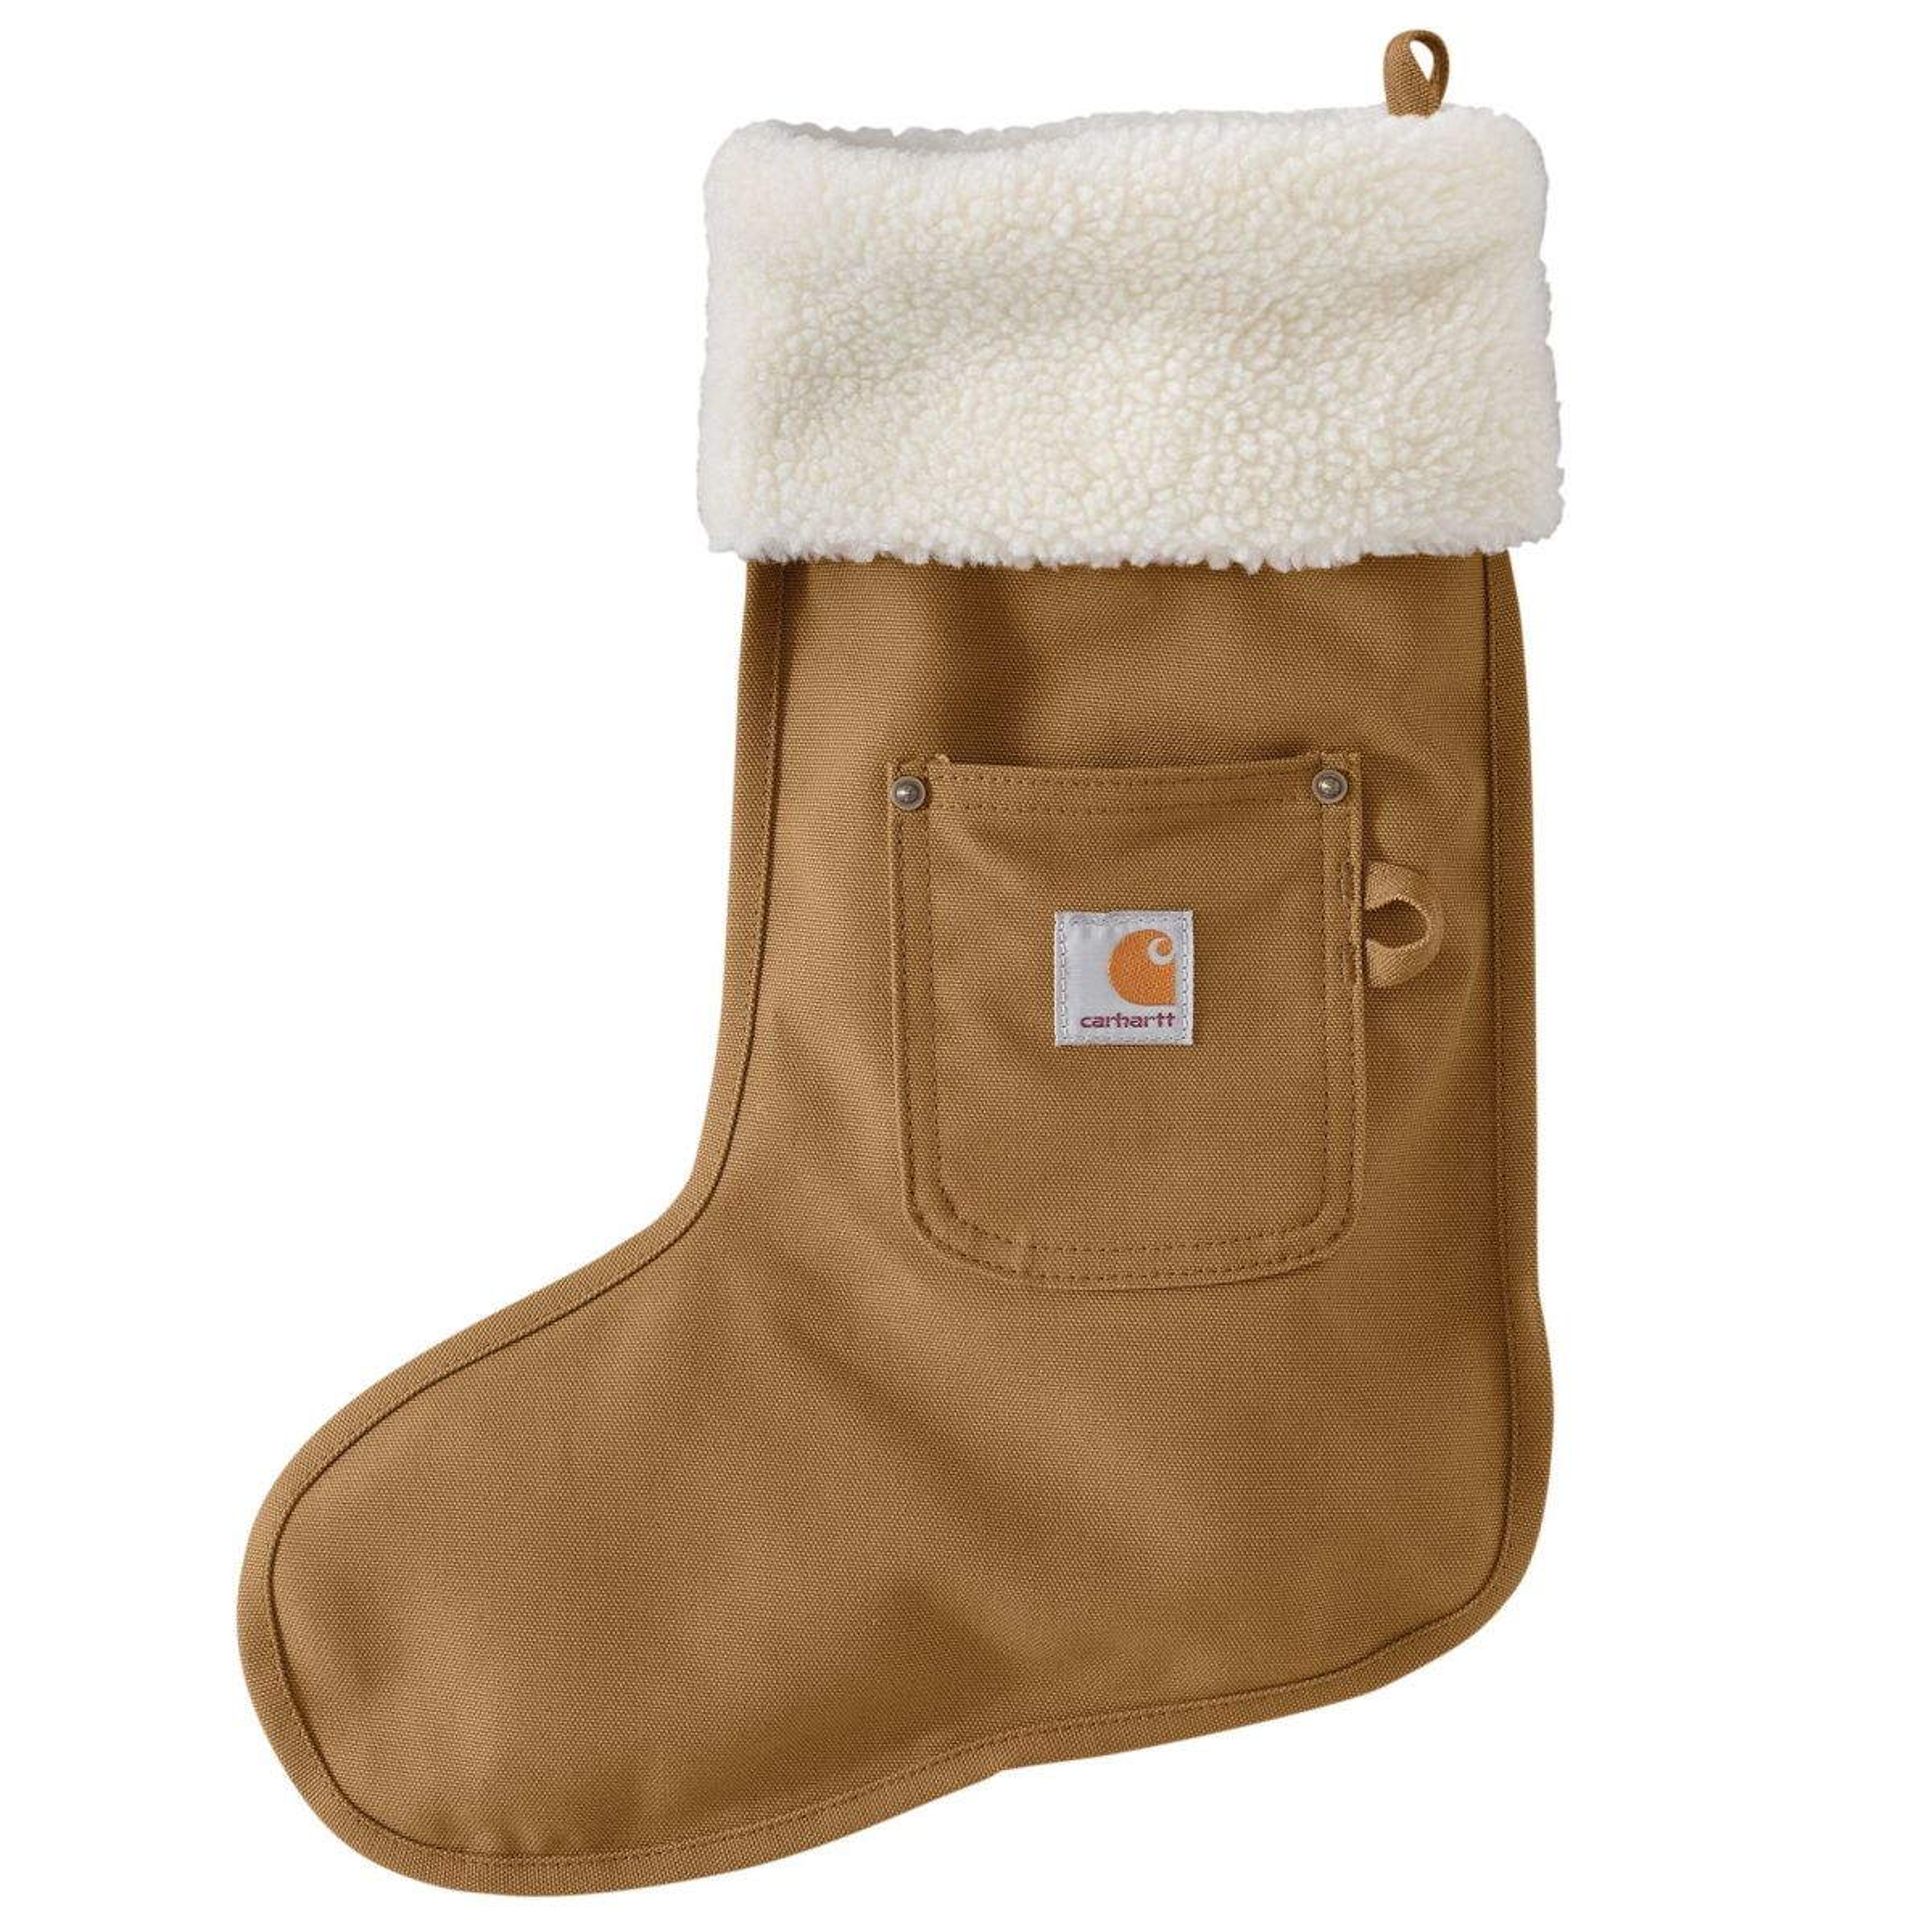 Buy Mens Christmas Stocking - Carhartt Online at Best price - TX